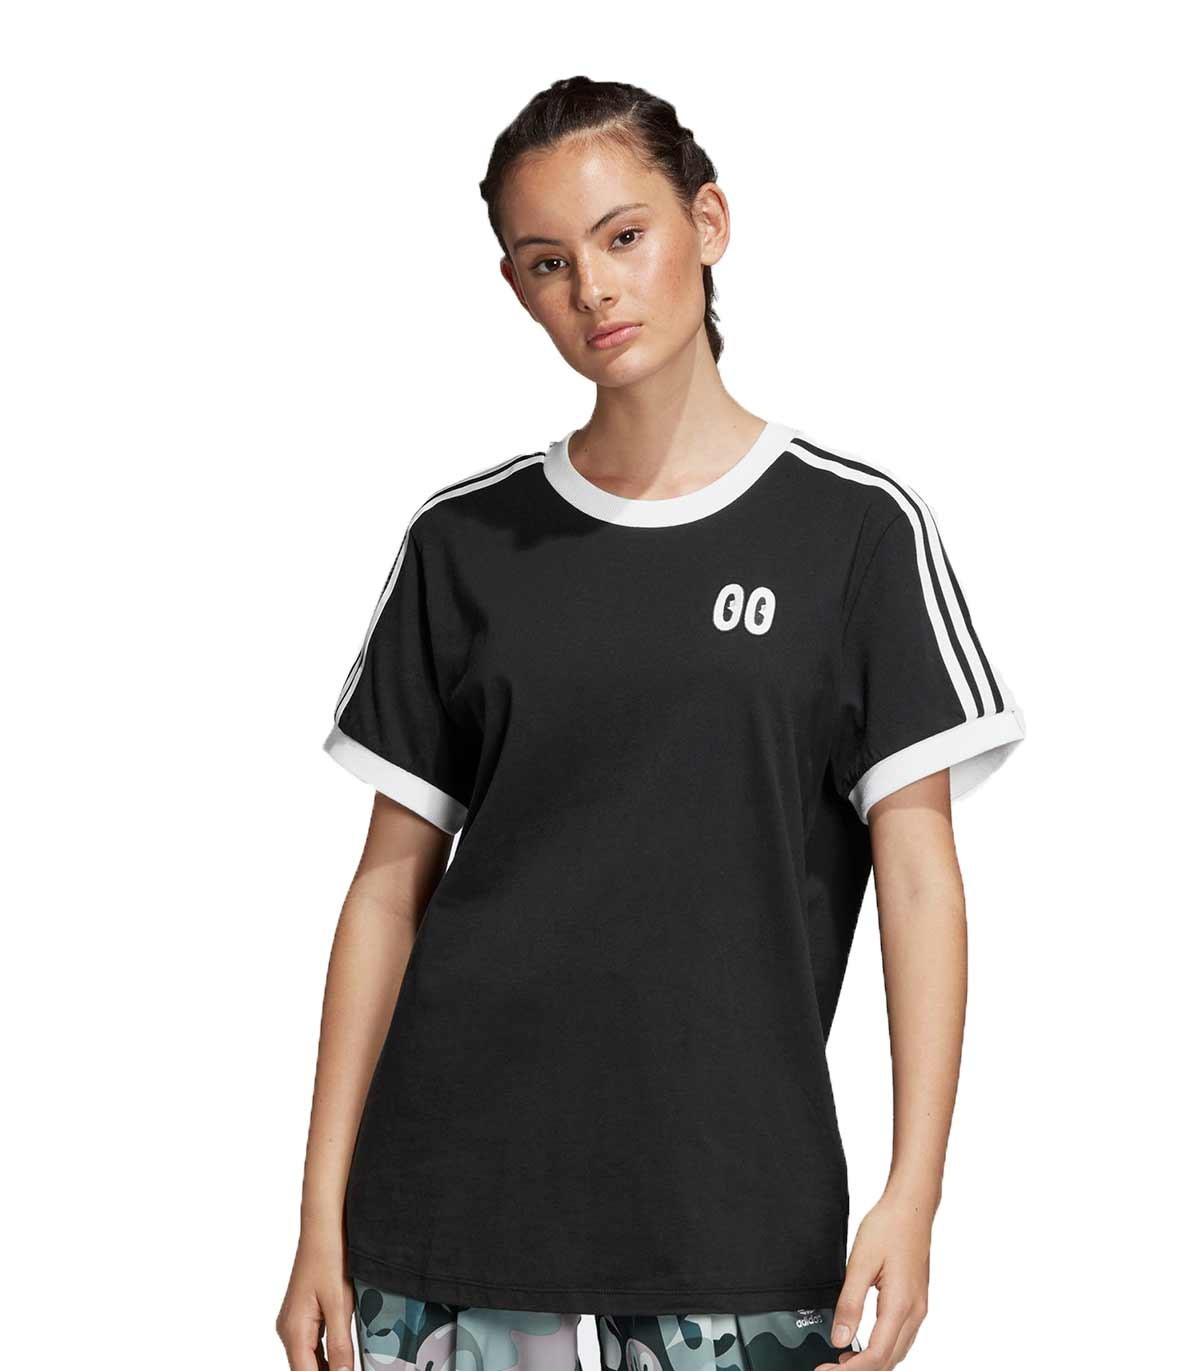 262f7e7ac Buy Camiseta Adidas 3 Stripes Tee